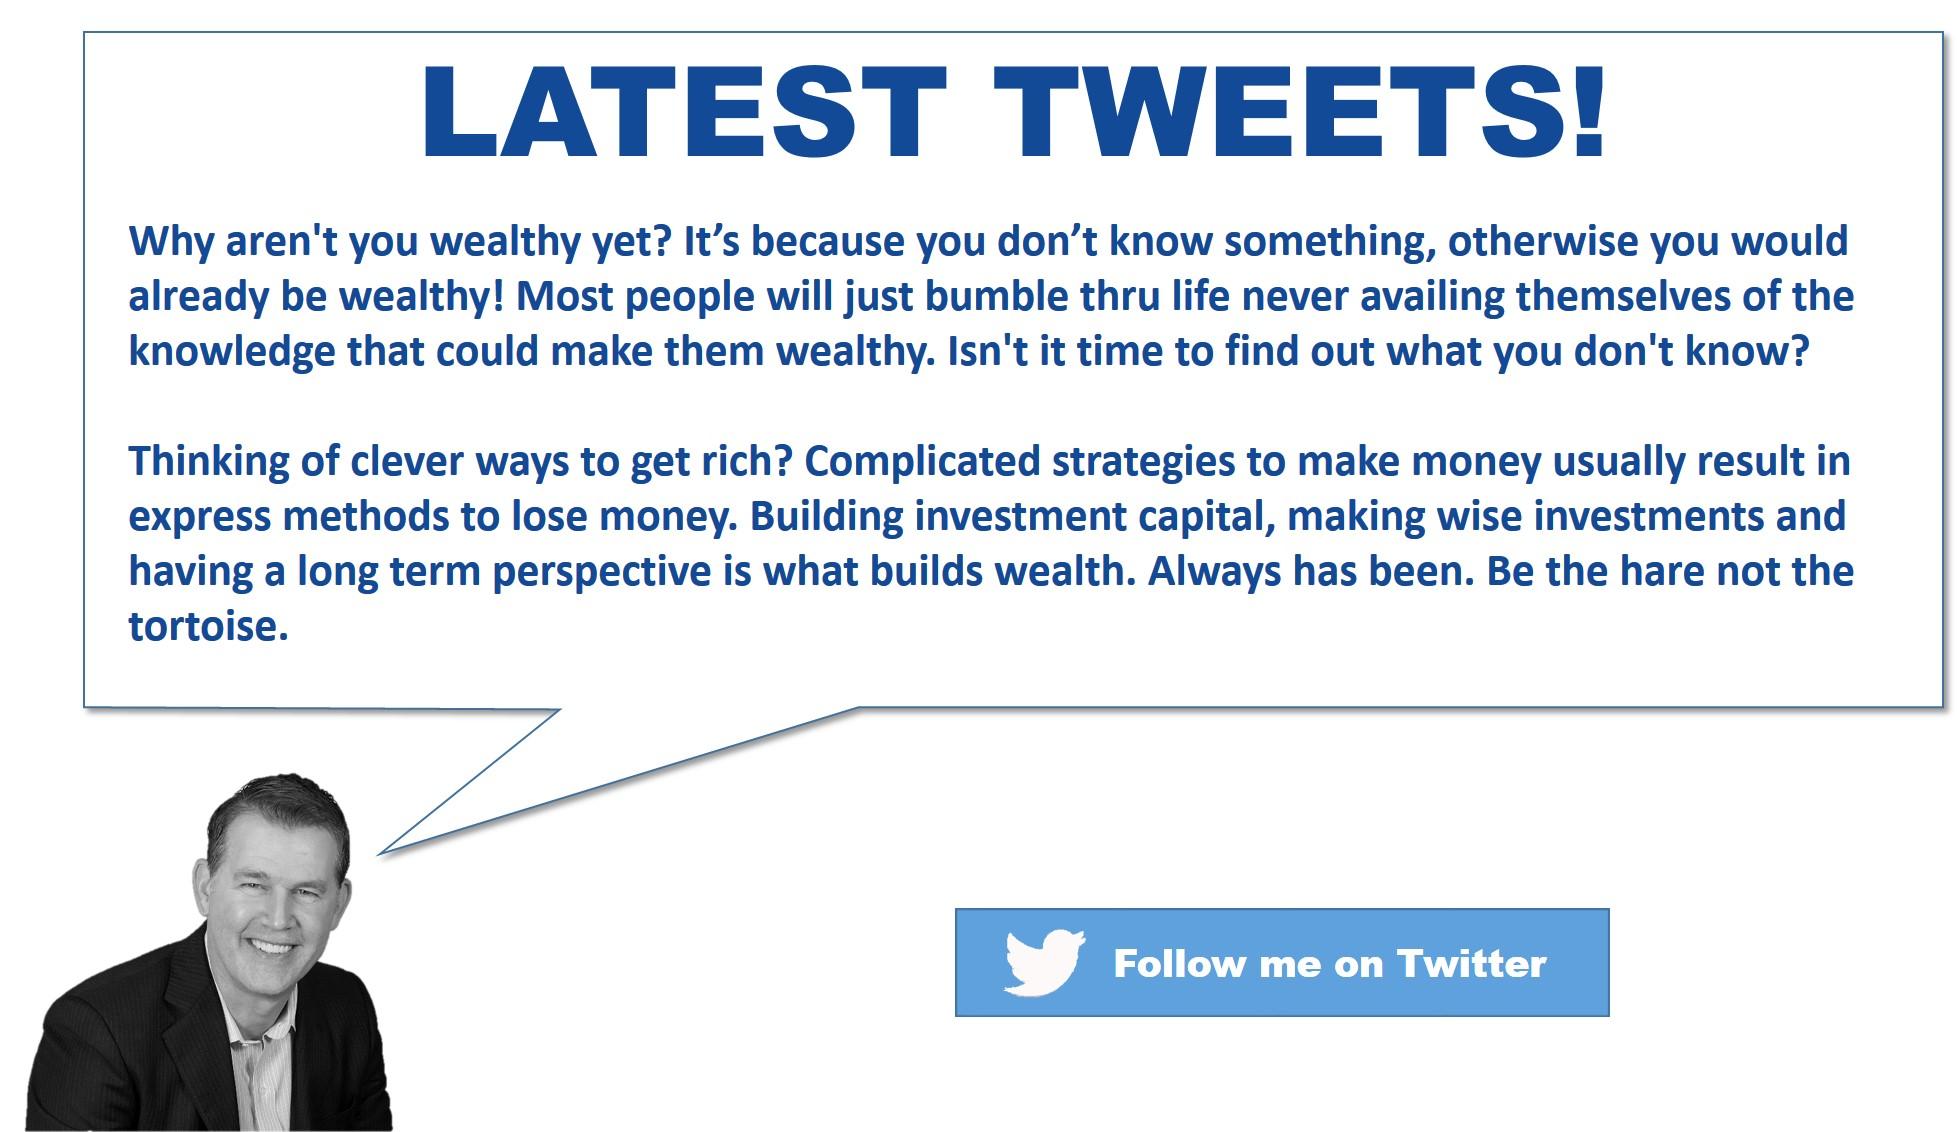 MontyCampbell-Tweets-8-30-18